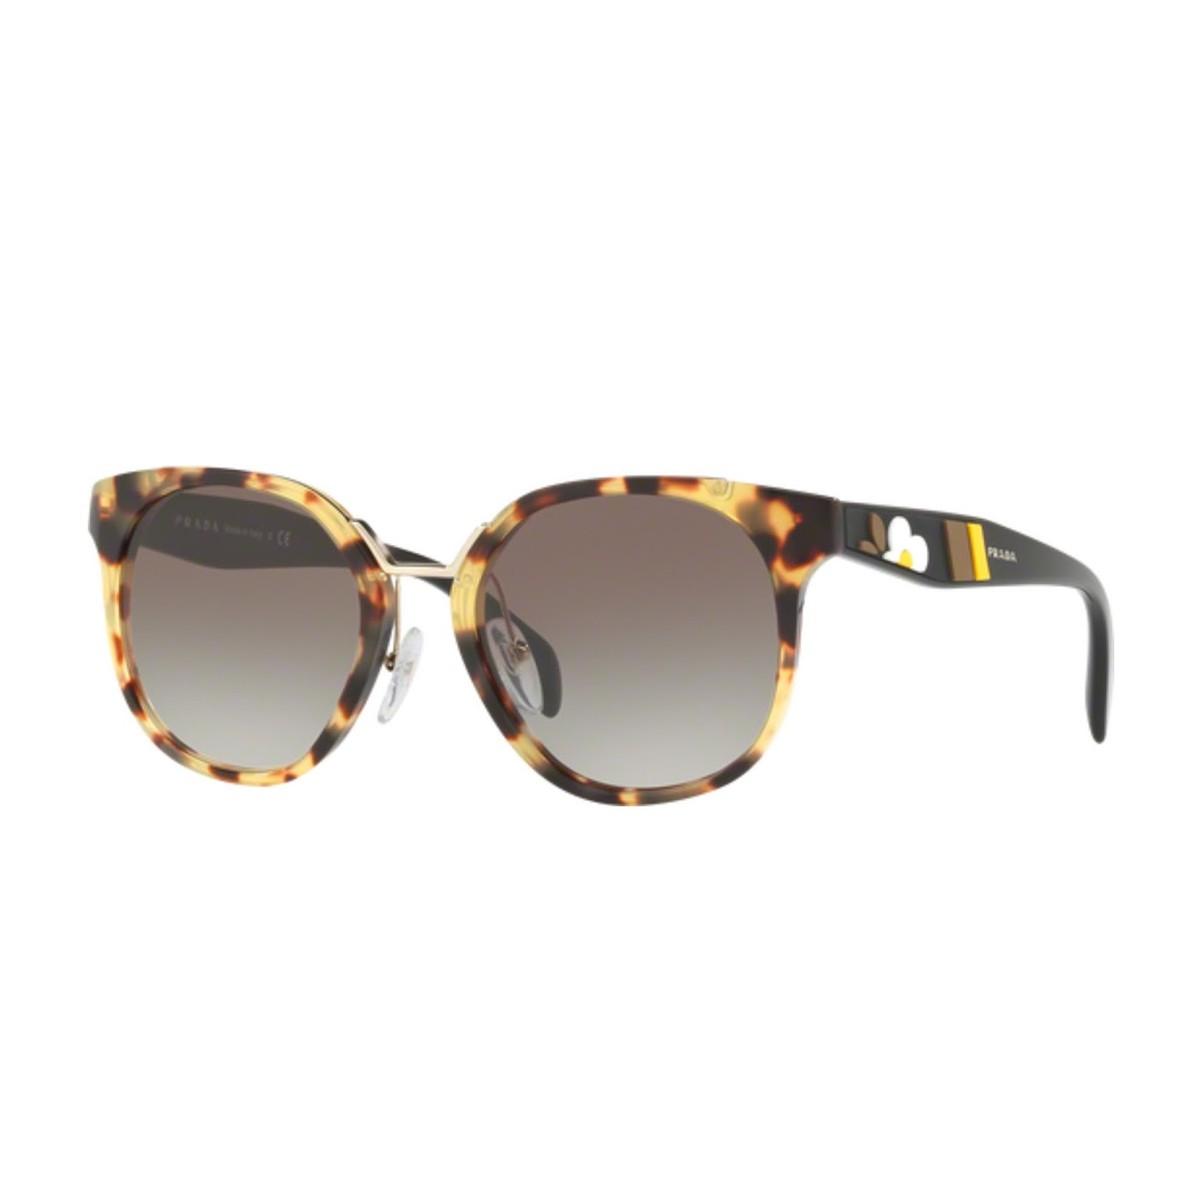 Prada PR 17TS | Women's sunglasses